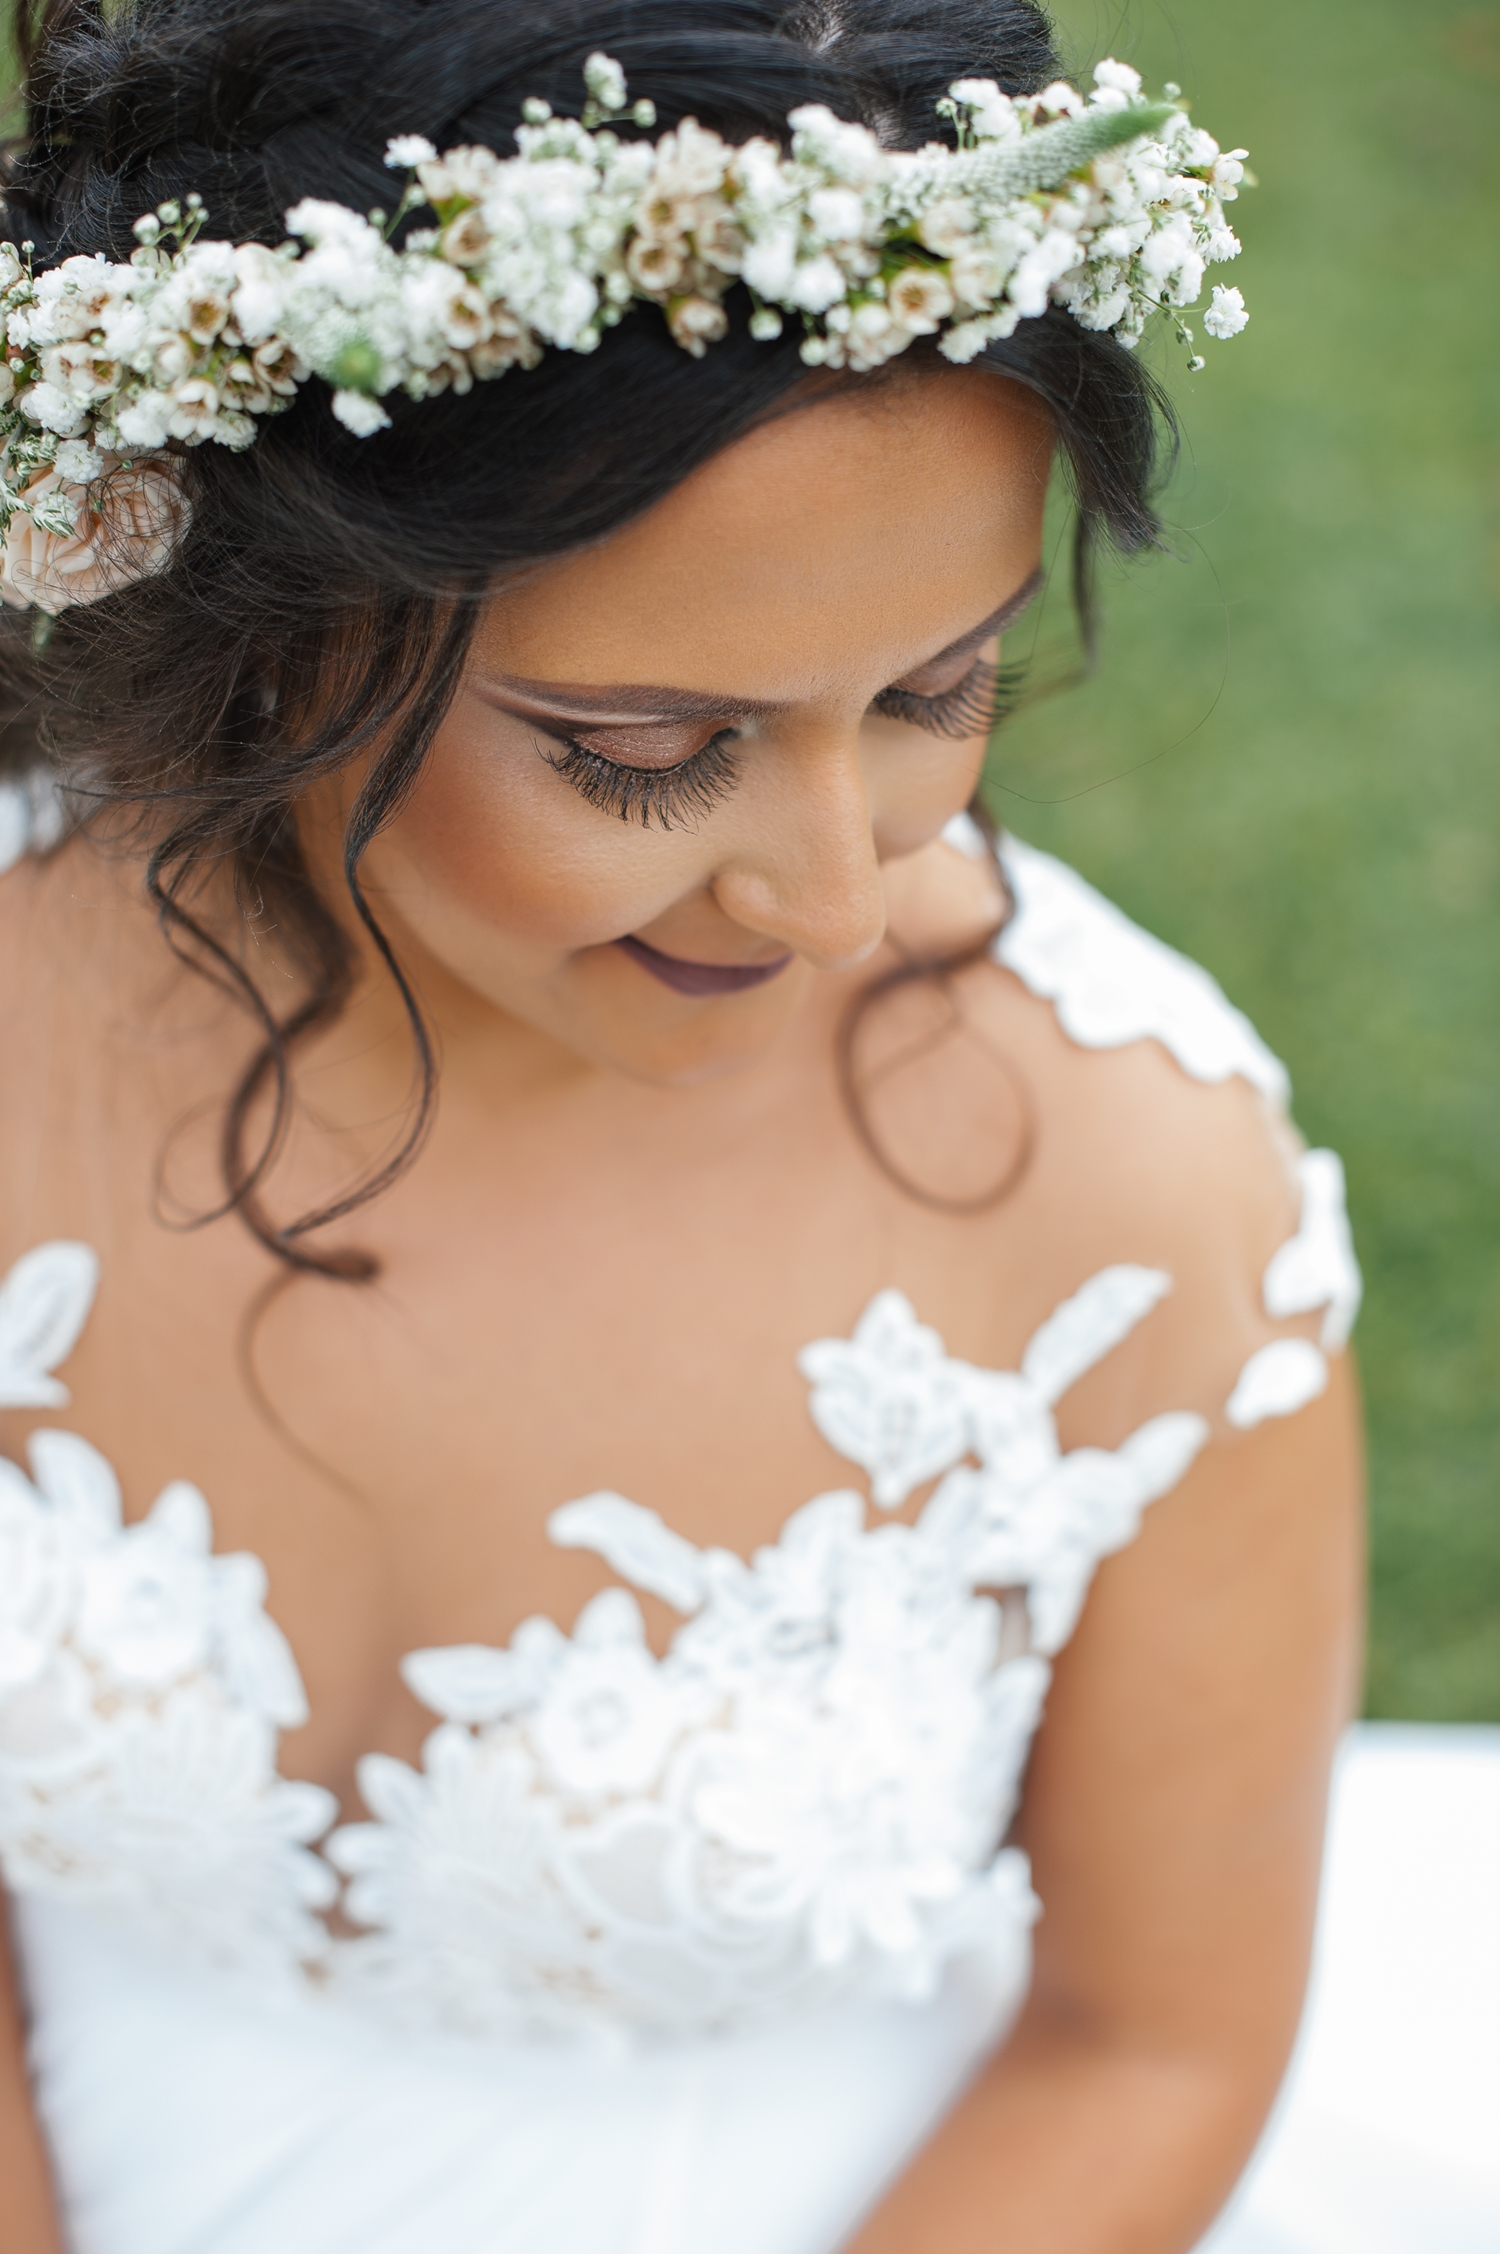 Fotograf profesionist de nunta, nunta, fotograf profesionist, fotograf Bucuresti, fotograf de nunta, portret mireasa, portret, portret sedinta foto profesionista